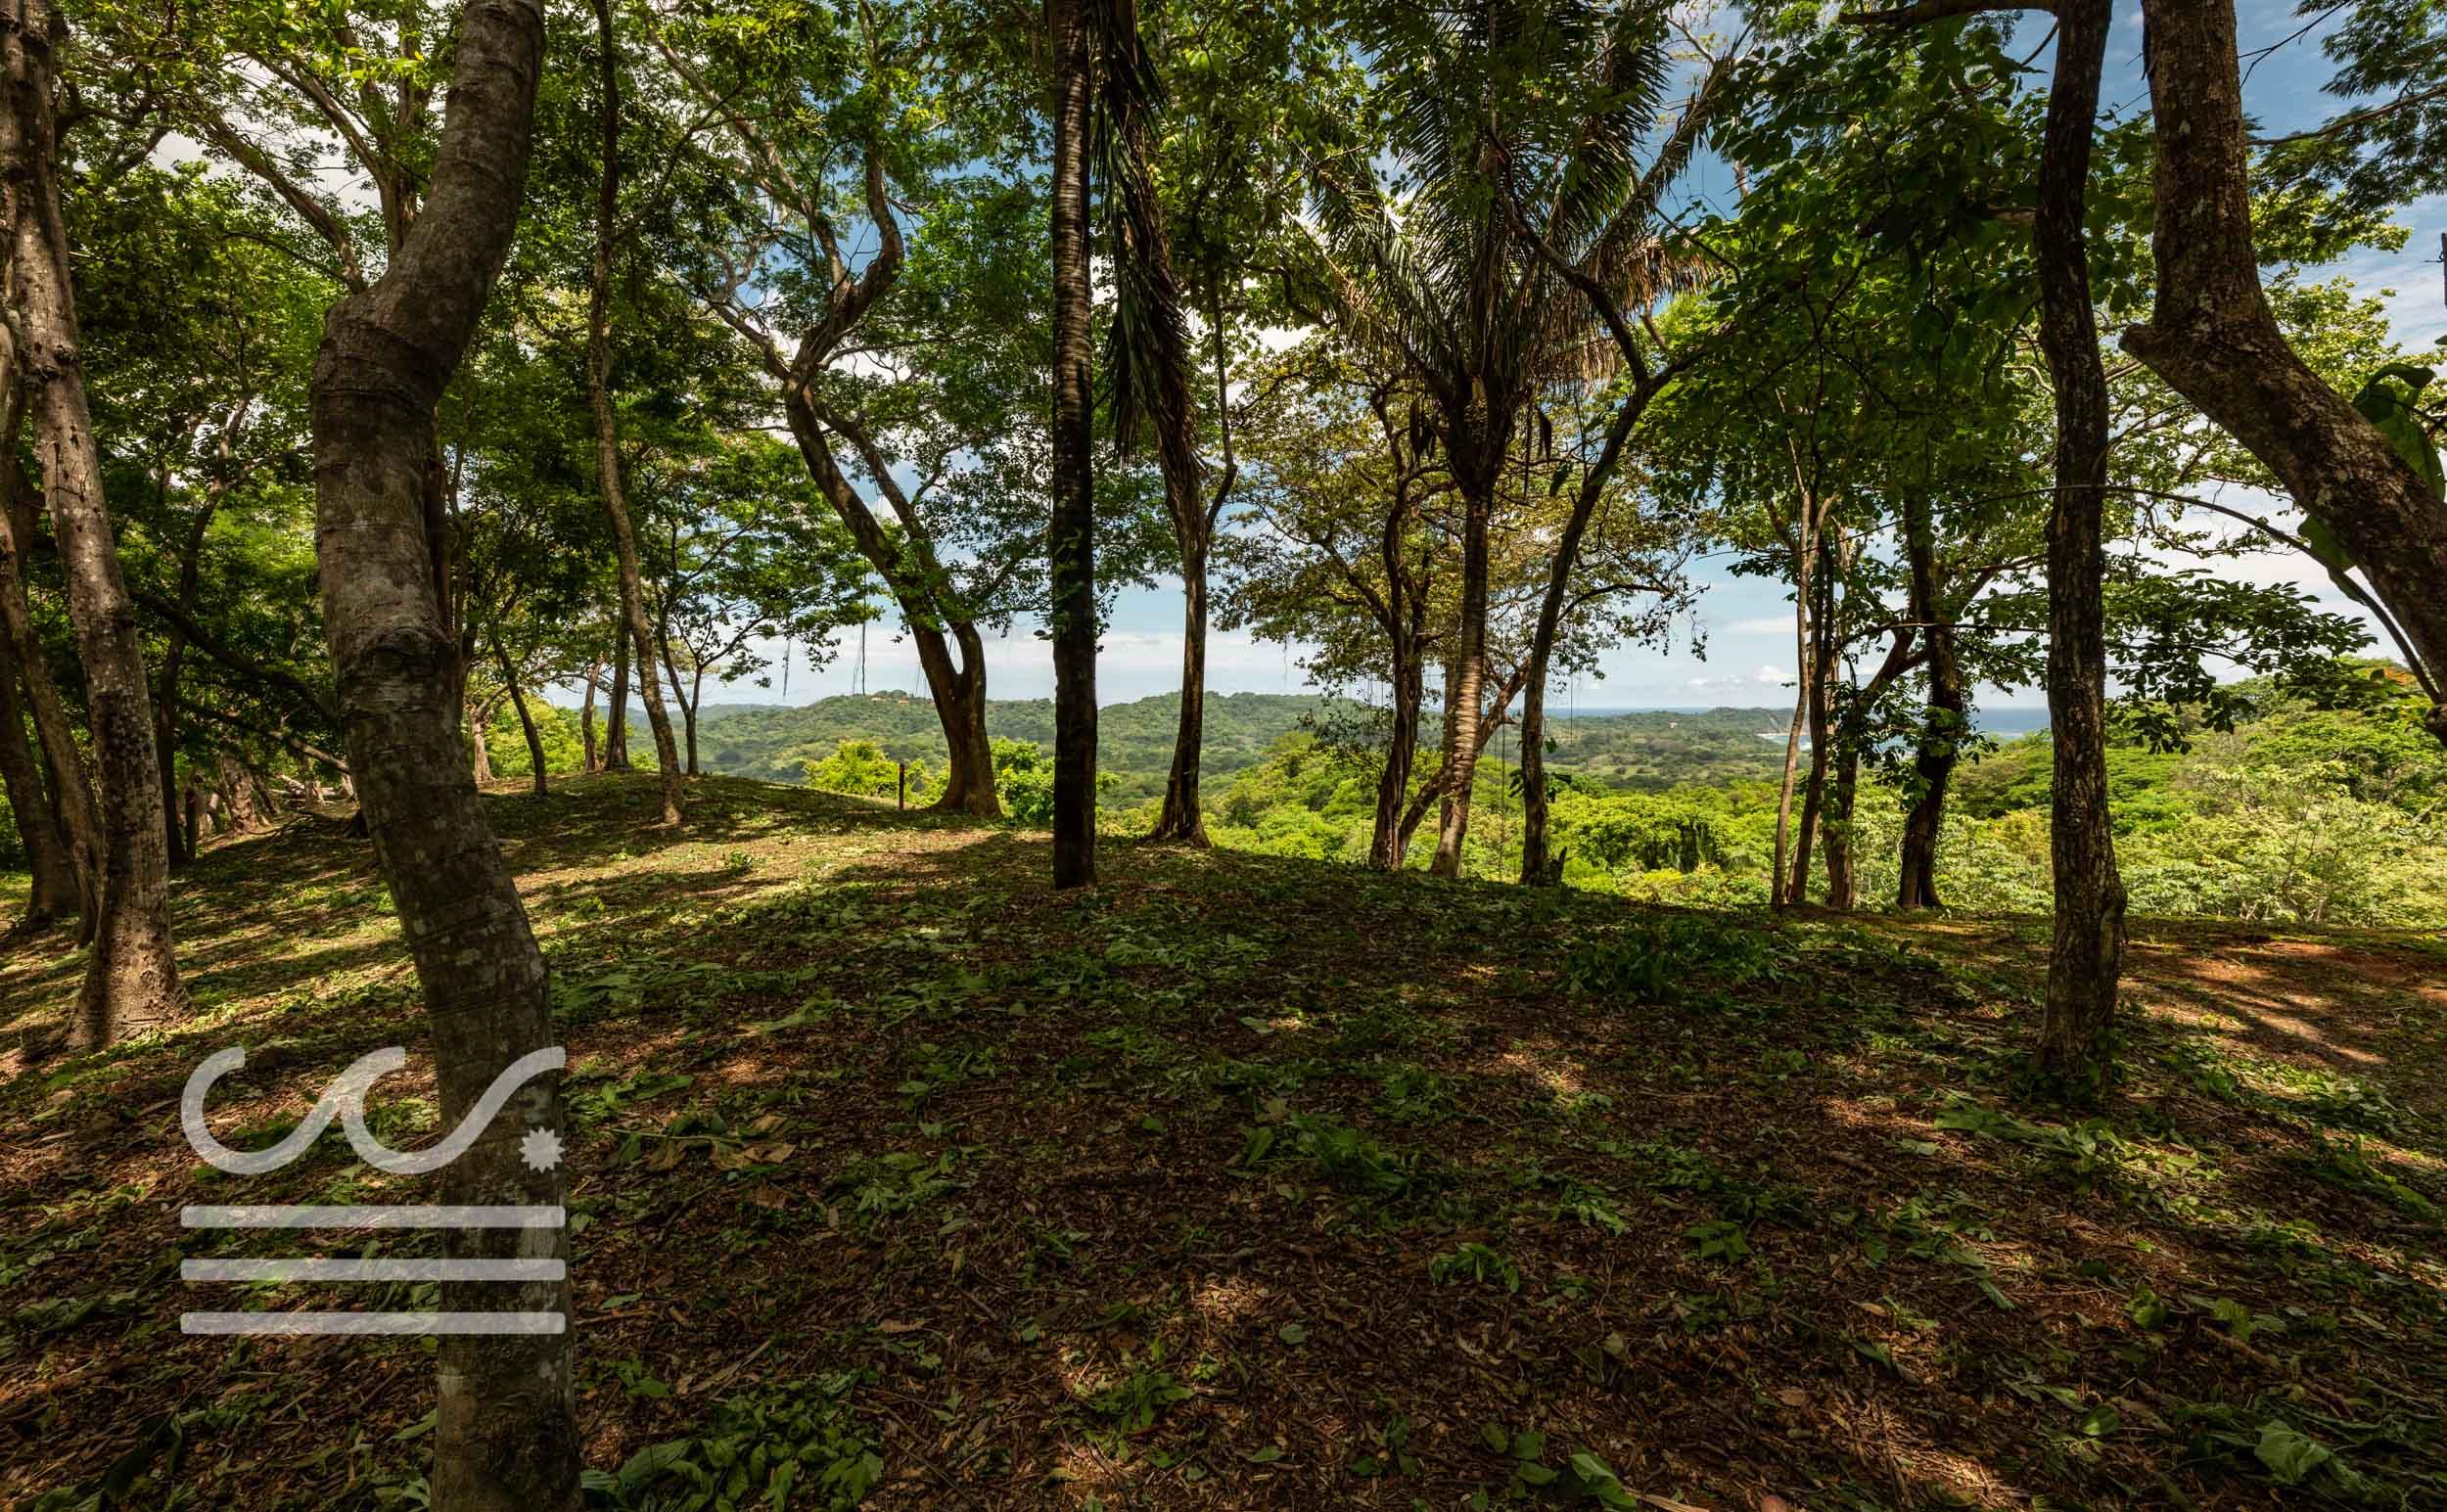 EE-102-Lot-Wanderlust-Realty-Real-Estate-Nosara-Costa-Rica-12.jpg